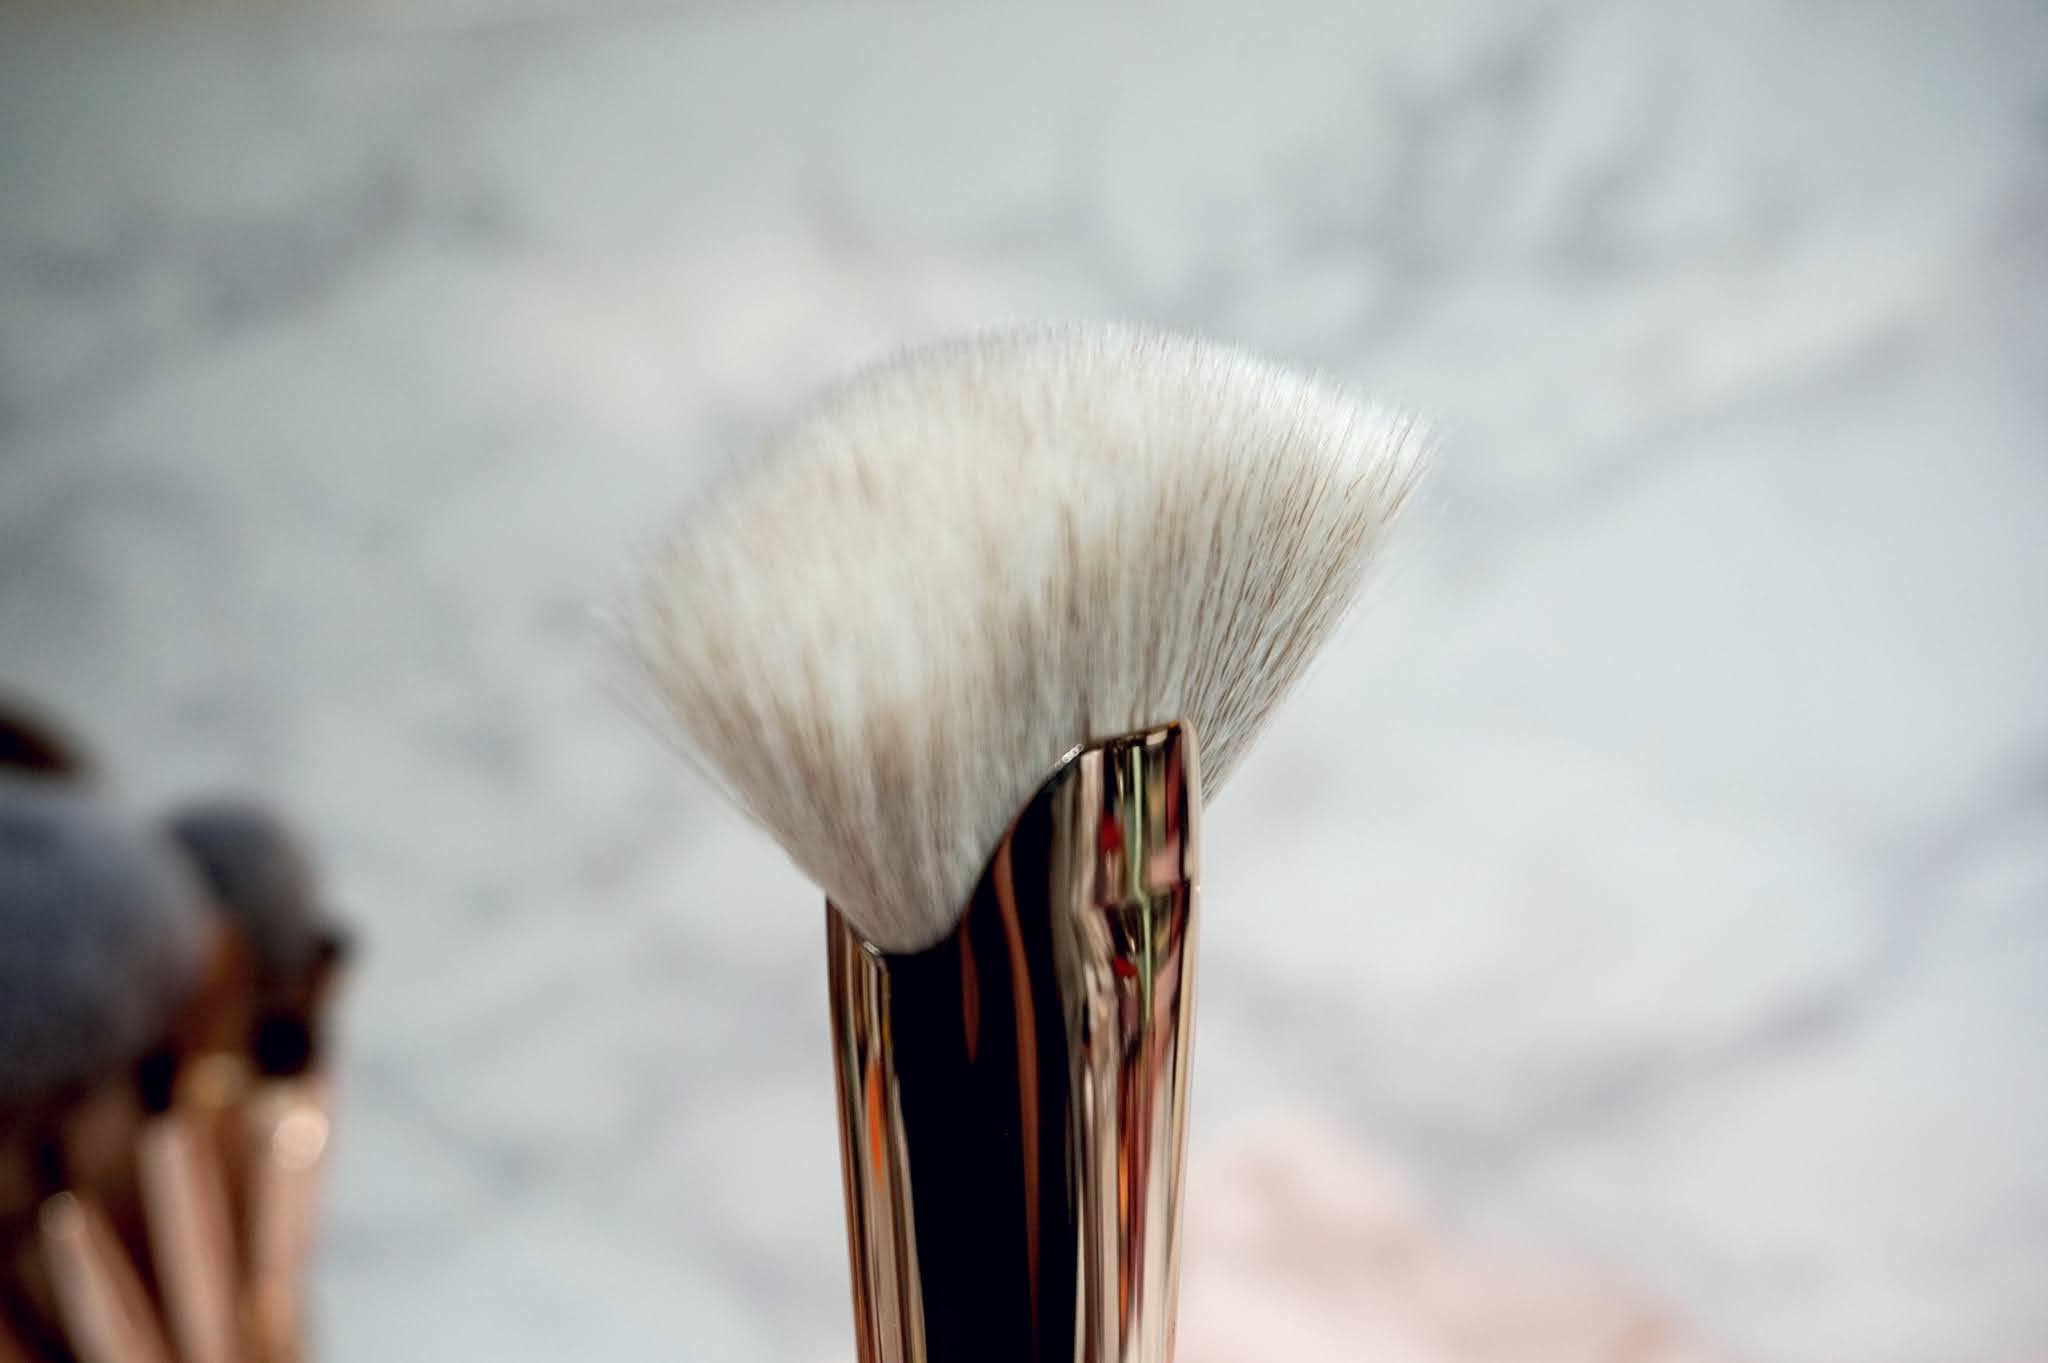 Patrick Ta Major Sculpt Creme Contour & Powder Bronzer Duo Review and Swatches